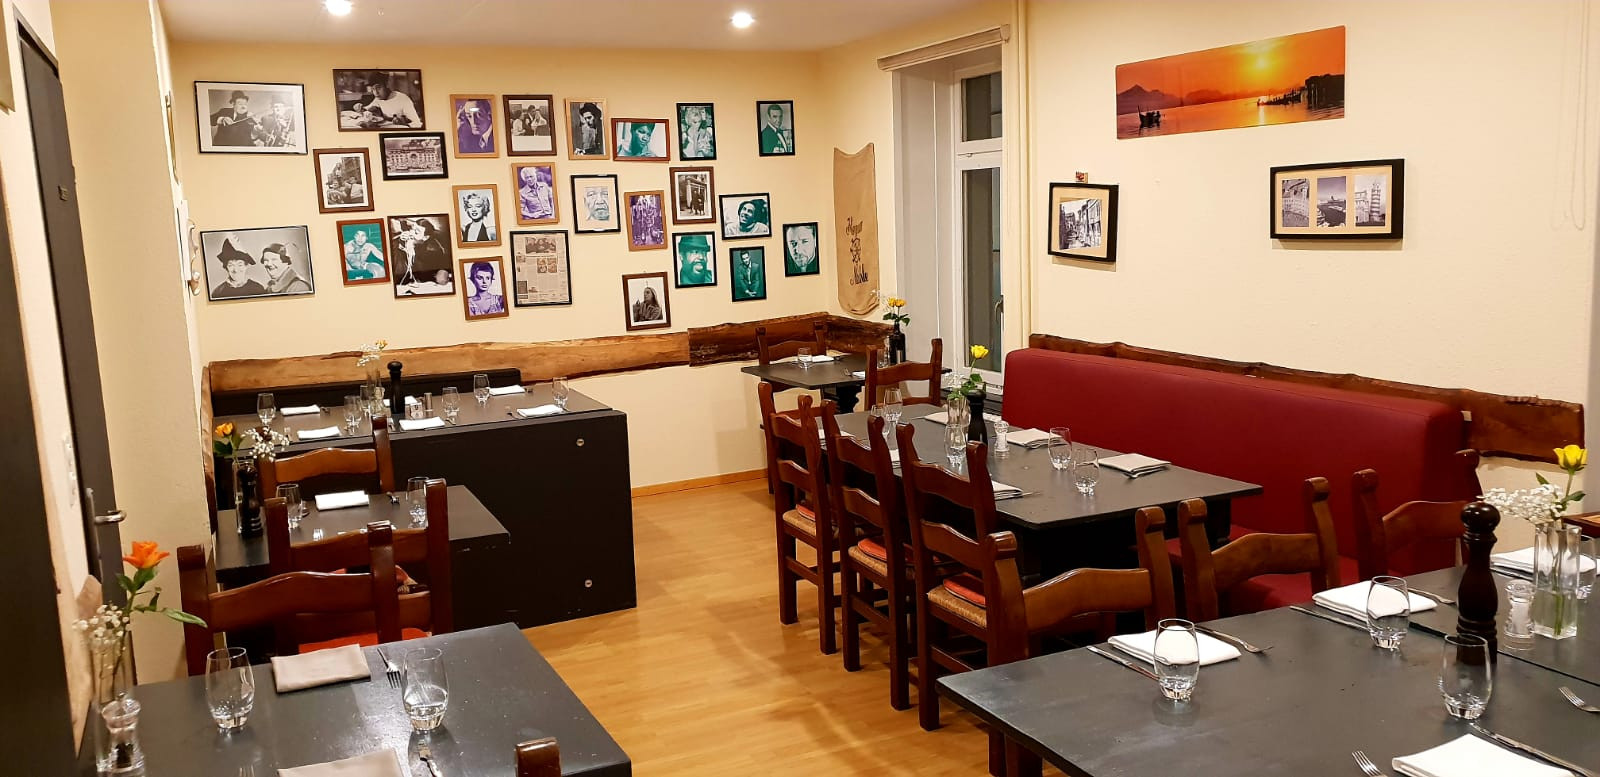 Pasta St. Gallen - Super Mario Restaurant